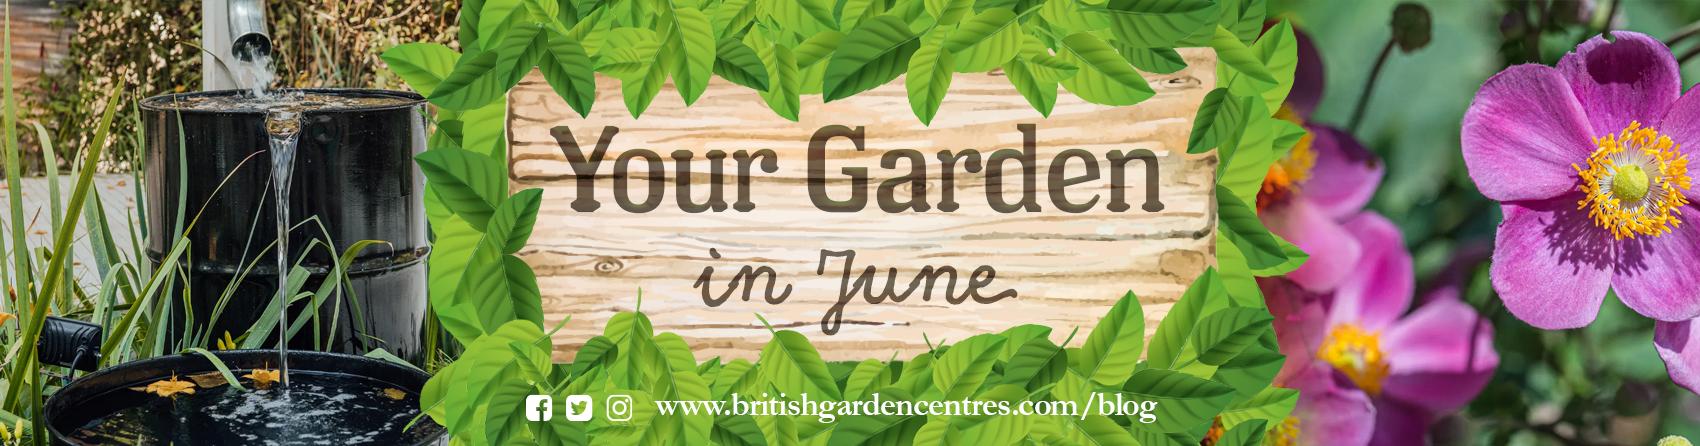 brigg garden buildings, home furniture brigg, garden tools north lincolnshire